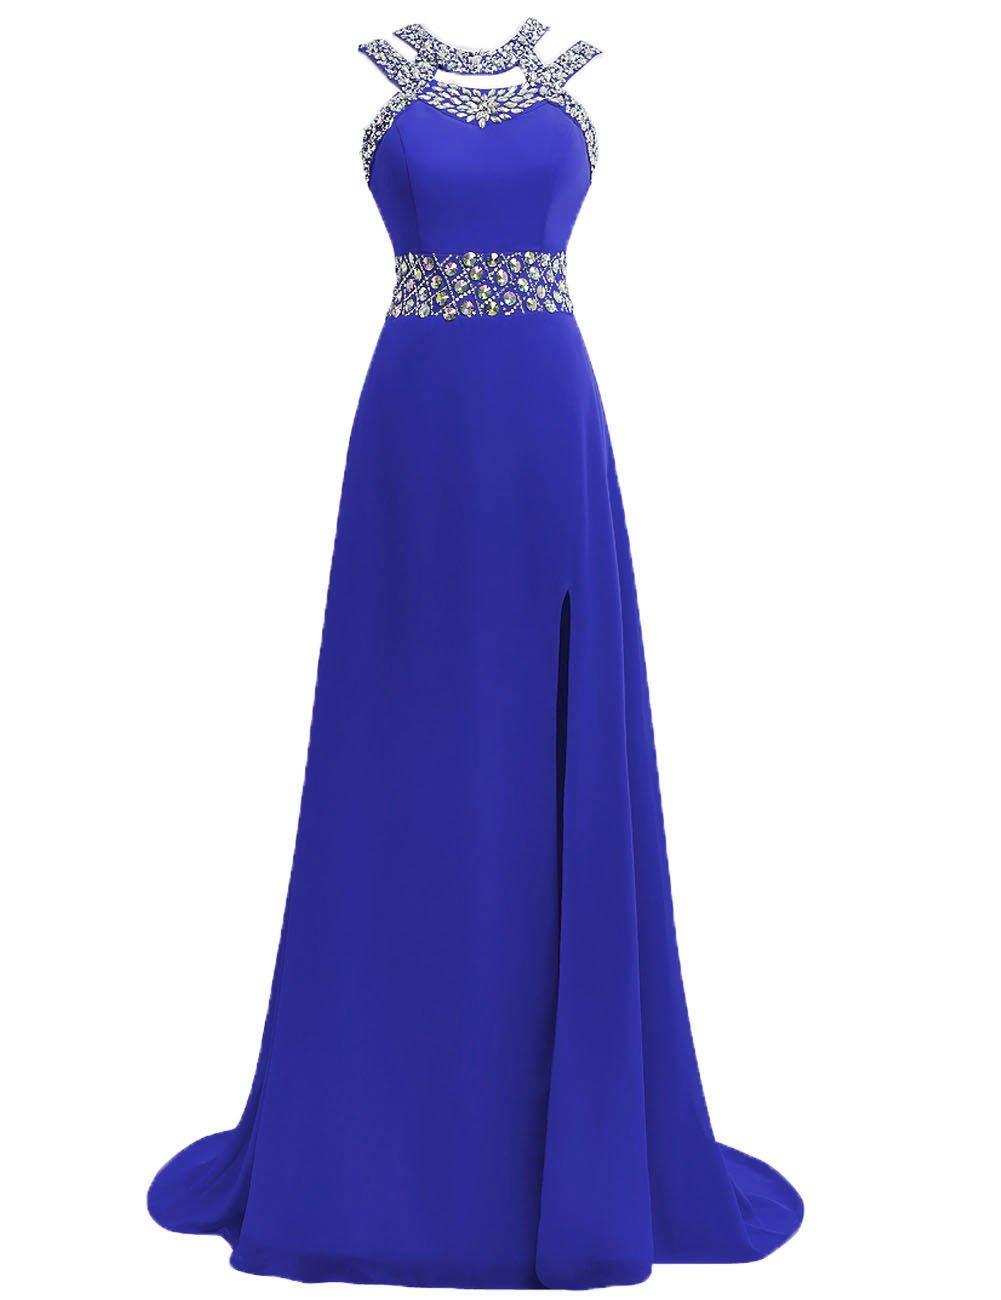 Prom Dress Halter Evening Gowns Formal Long Slit Chiffon Bridesmaid Dresses A line Open Back